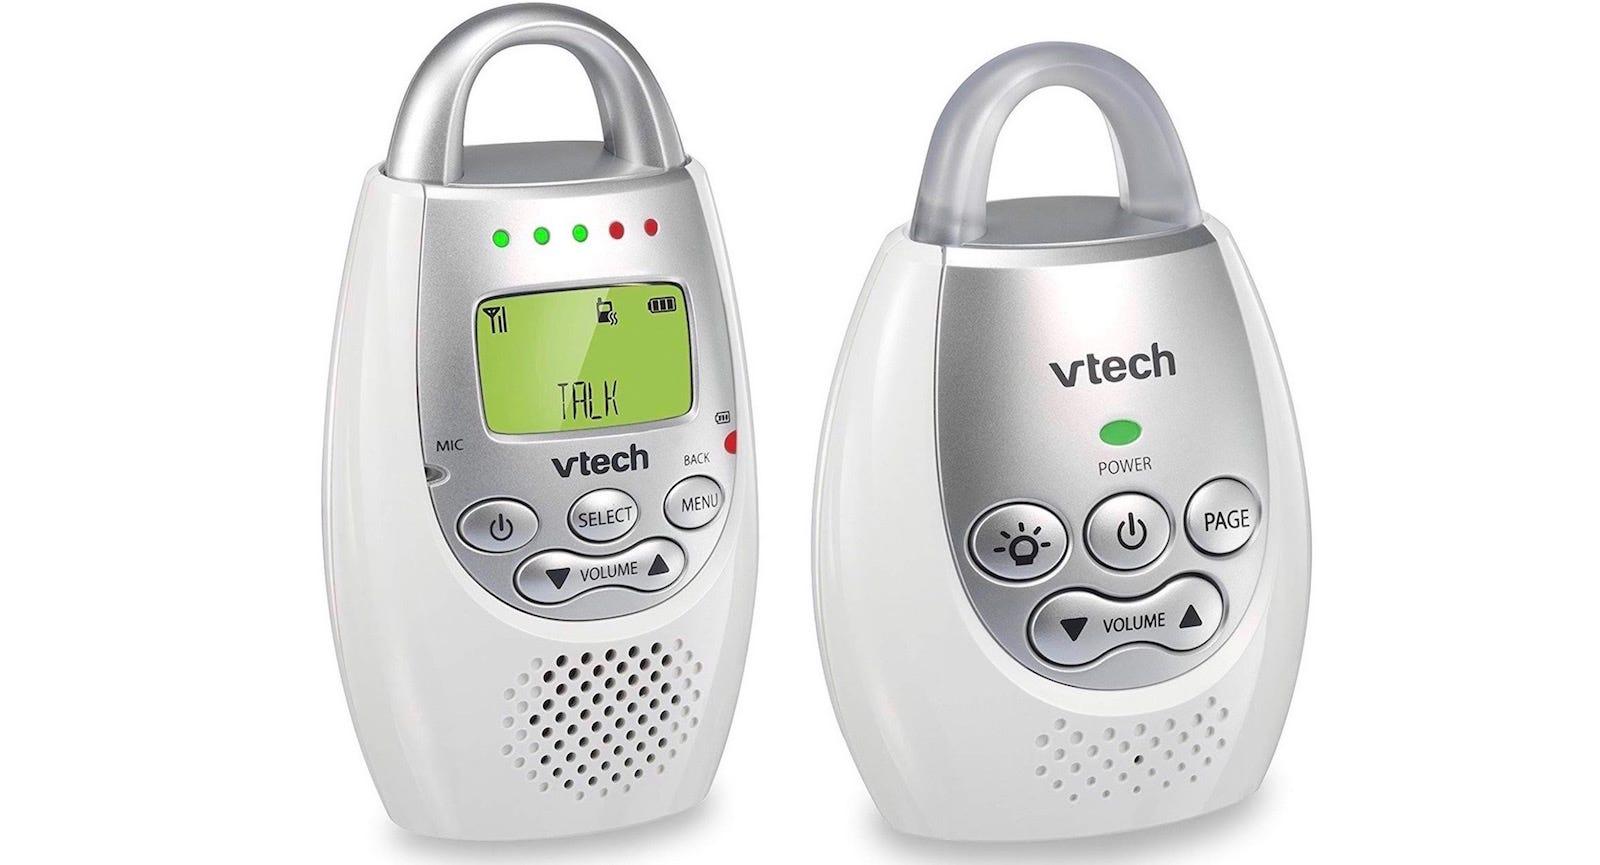 The VTech DM221 baby monitor.